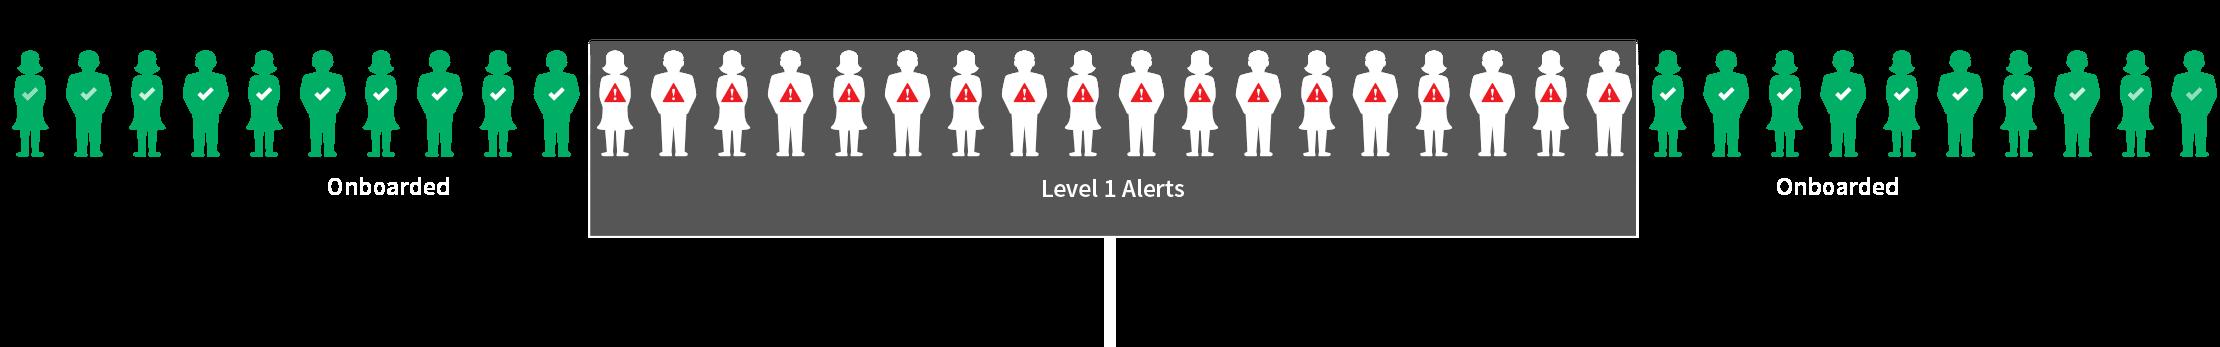 Level 1 Alerts